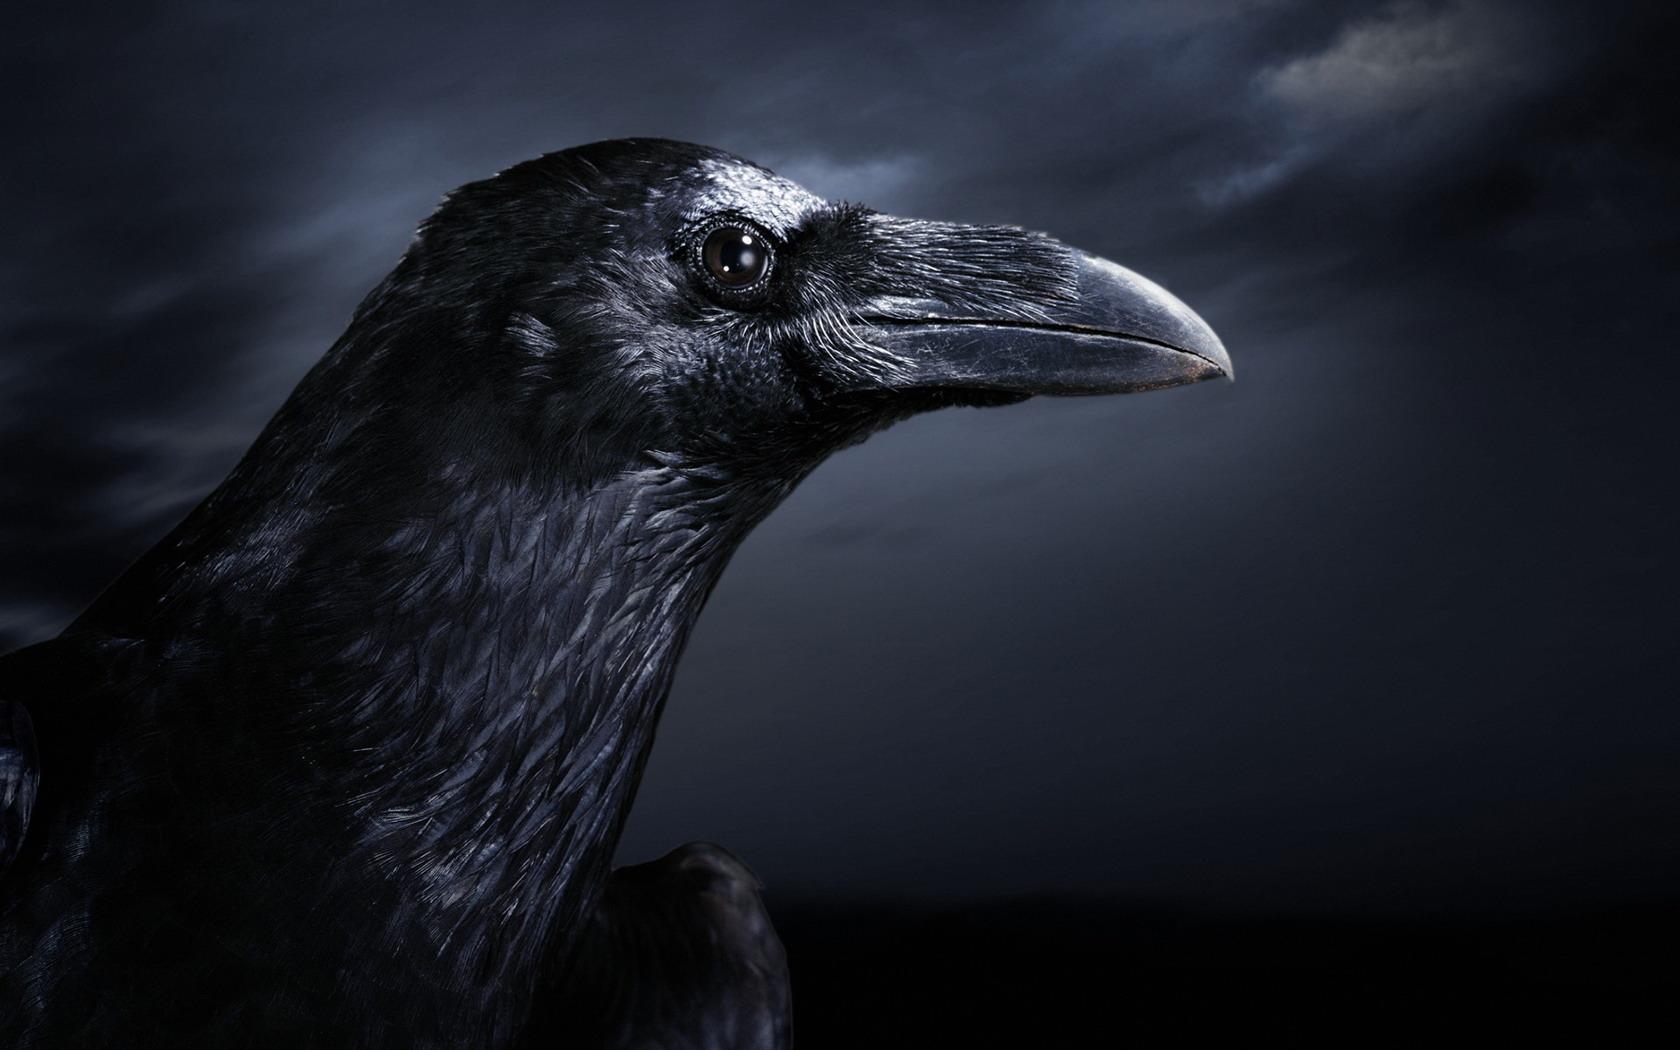 Raven · Raven · Raven Wallpaper · Raven Wallpaper ...